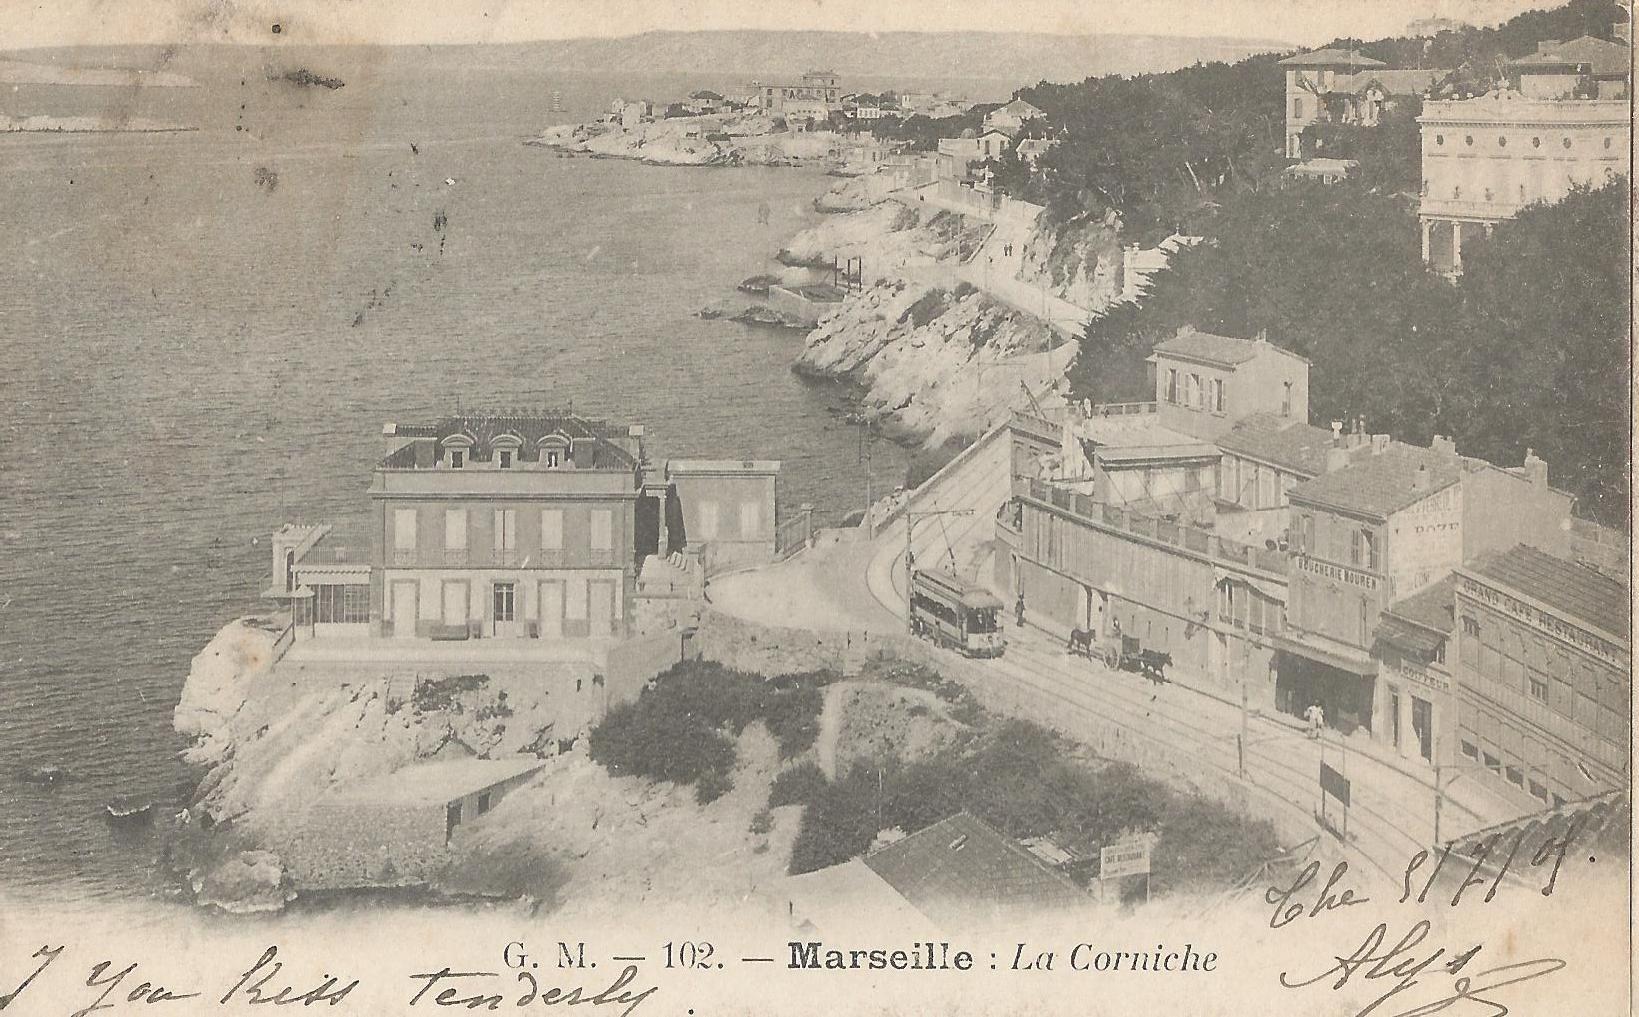 La Corniche Marseille, Photos anciennes, Photos